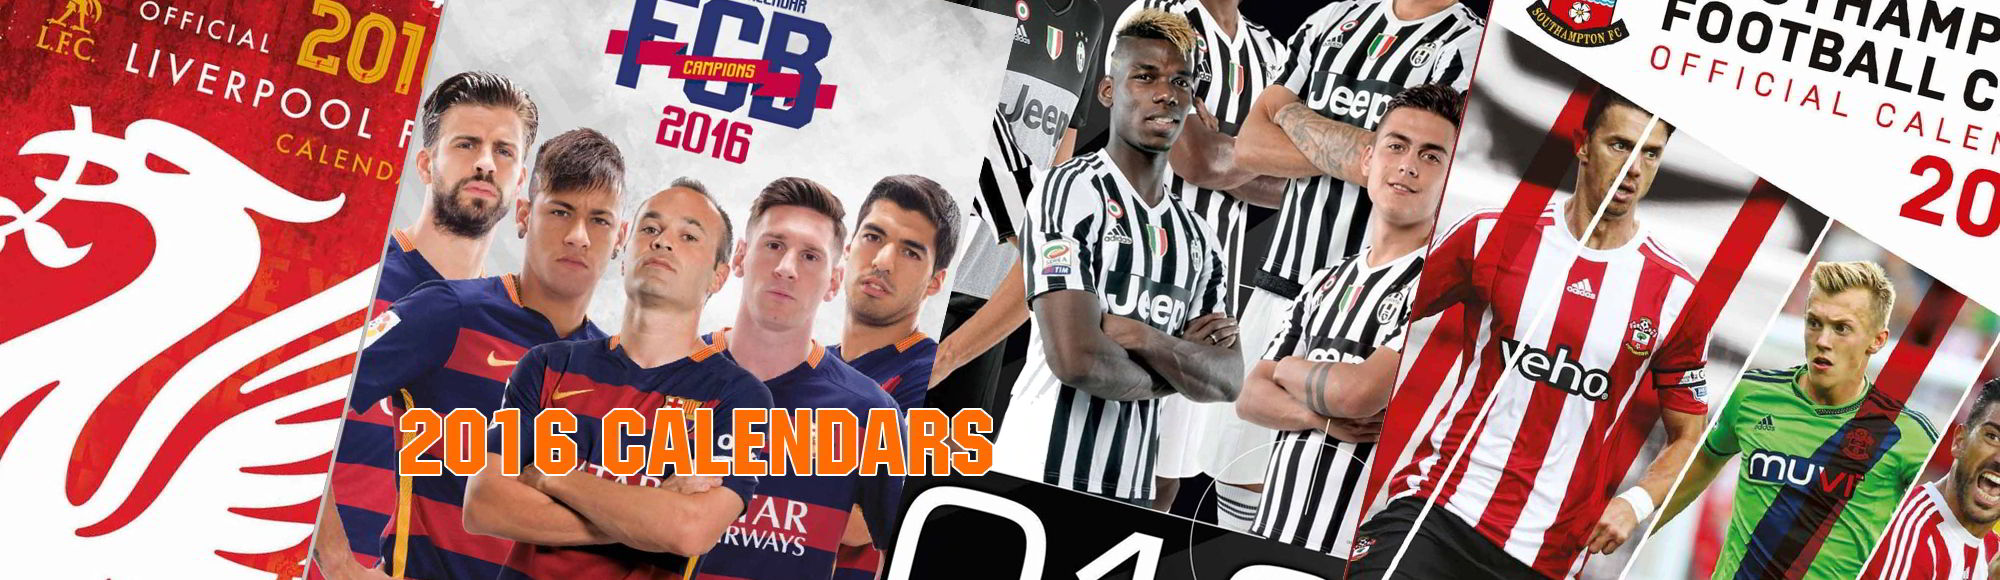 2016 Football Calendars